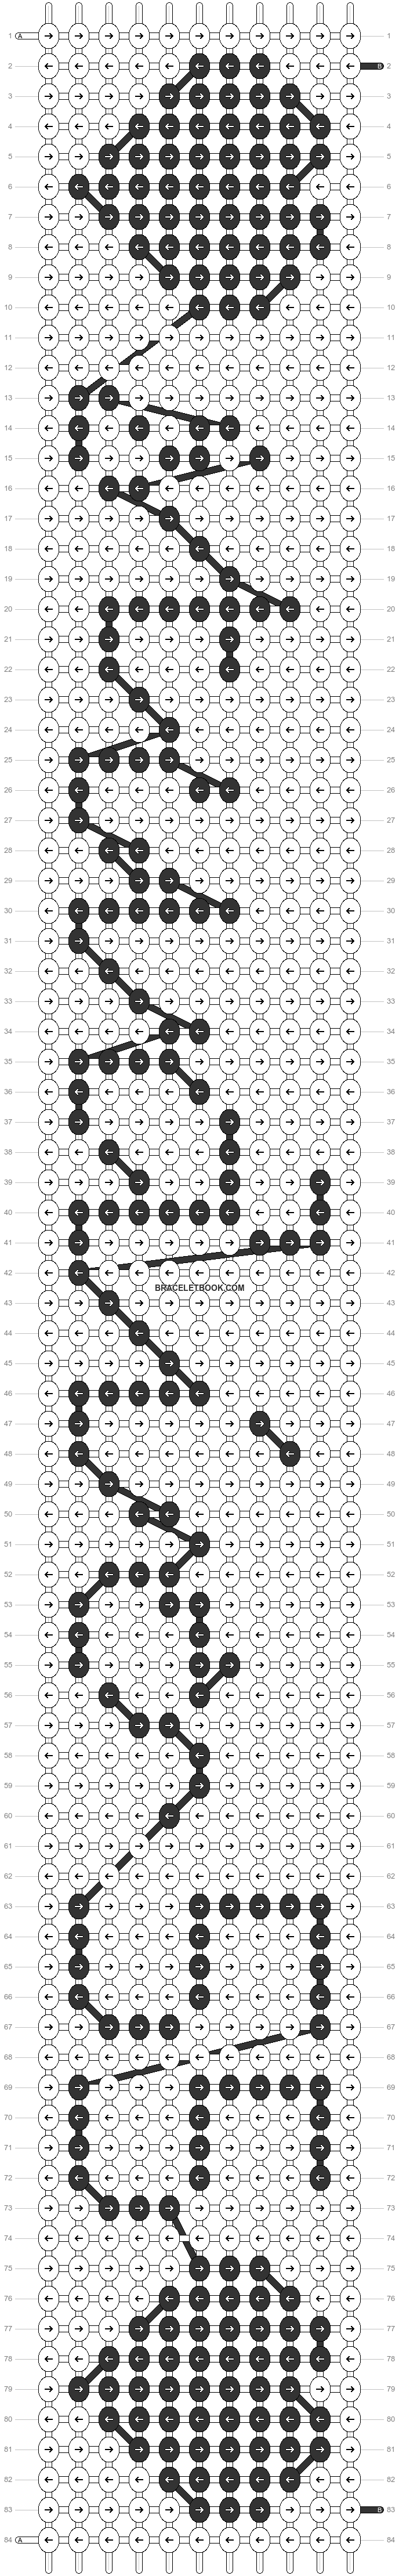 Alpha pattern #7536 pattern